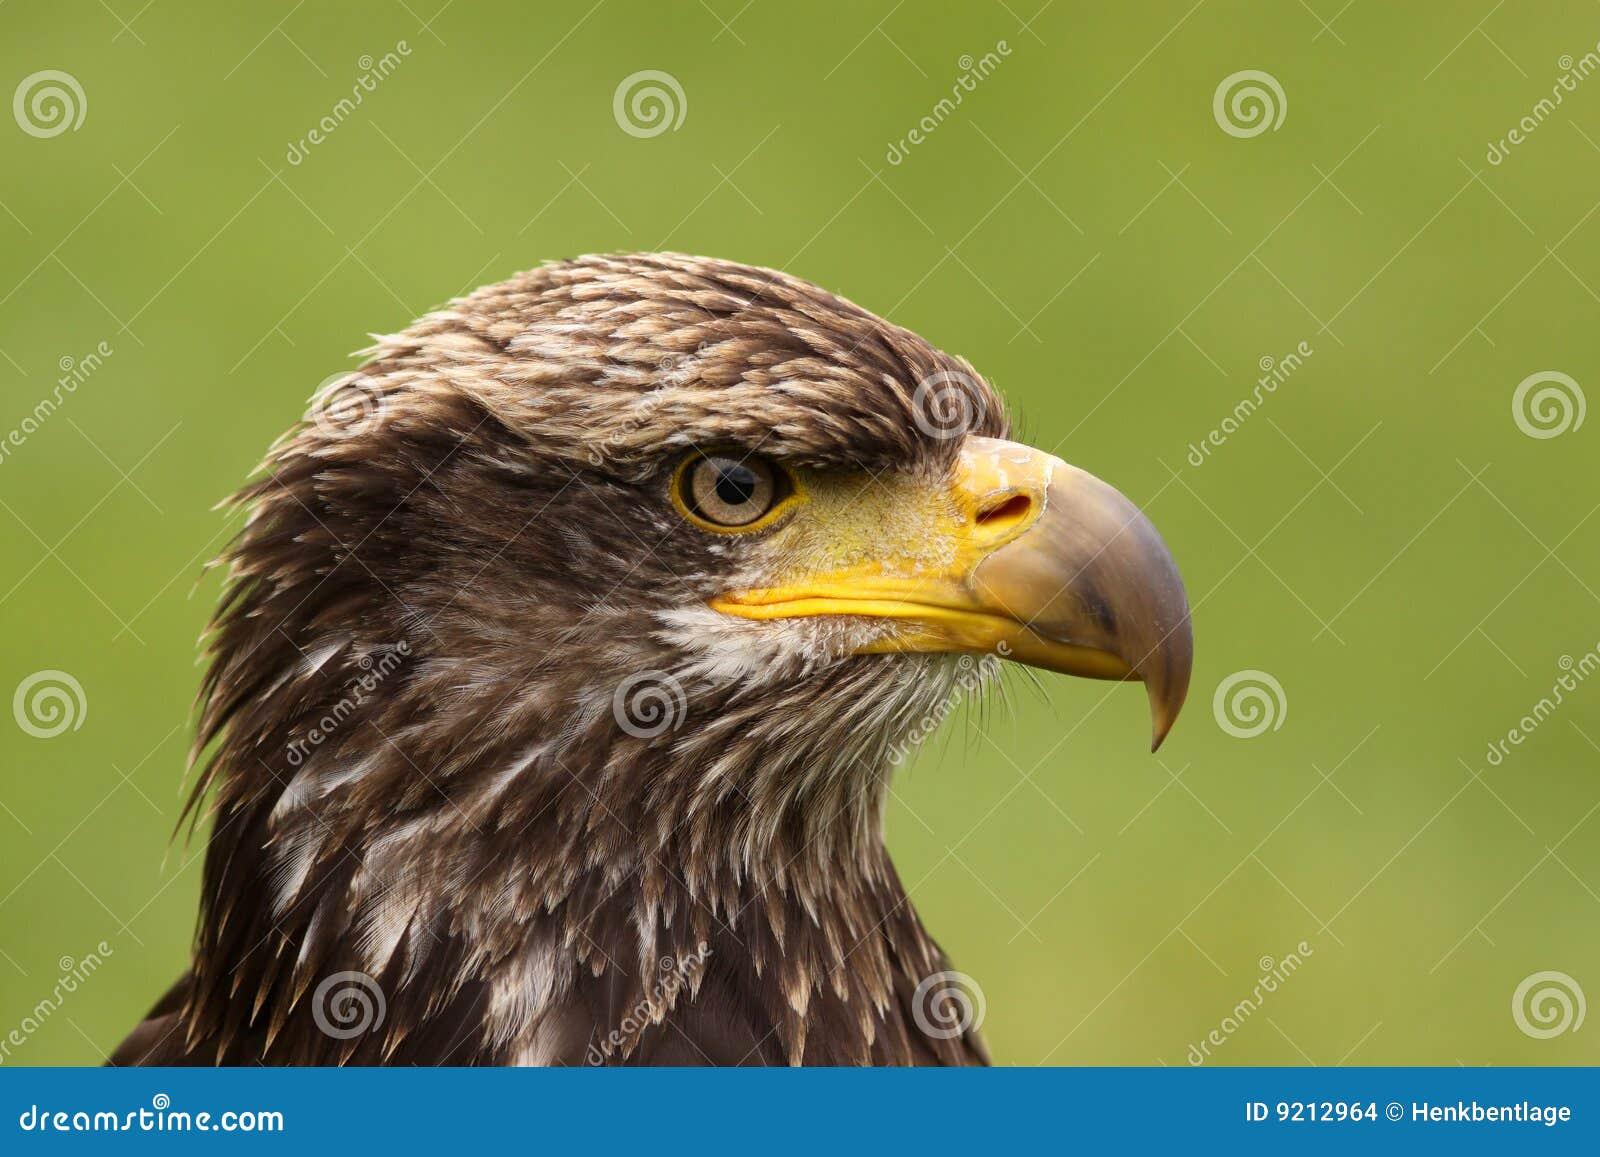 Портрет молодого облыселого орла